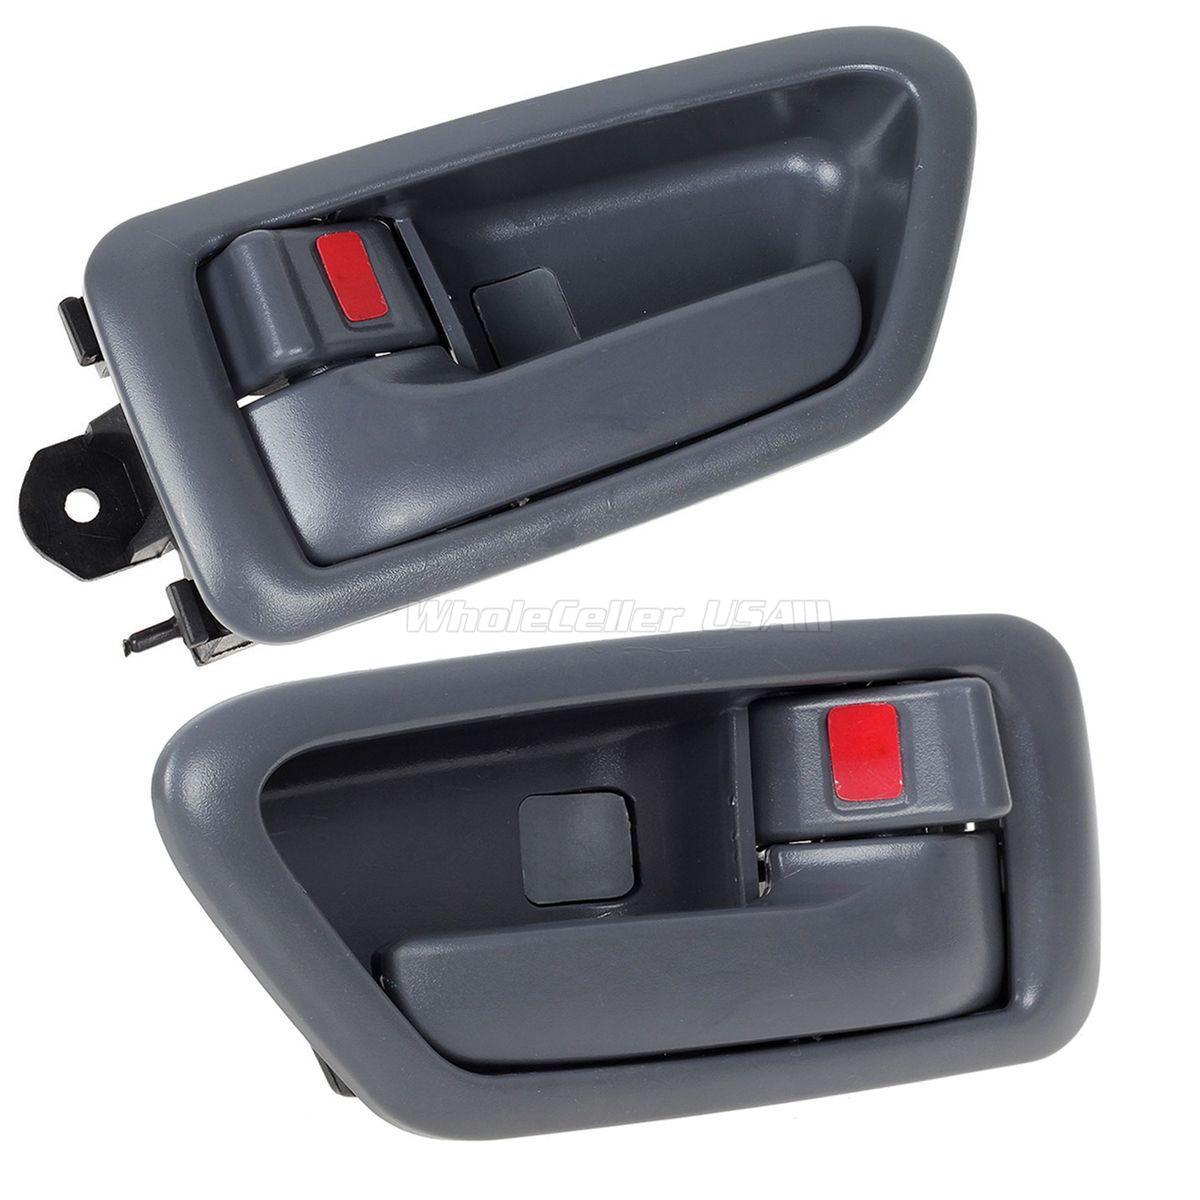 FITS Toyota Camry Front Passenger Door Handle Right 1997 1998 1999 2000 2001